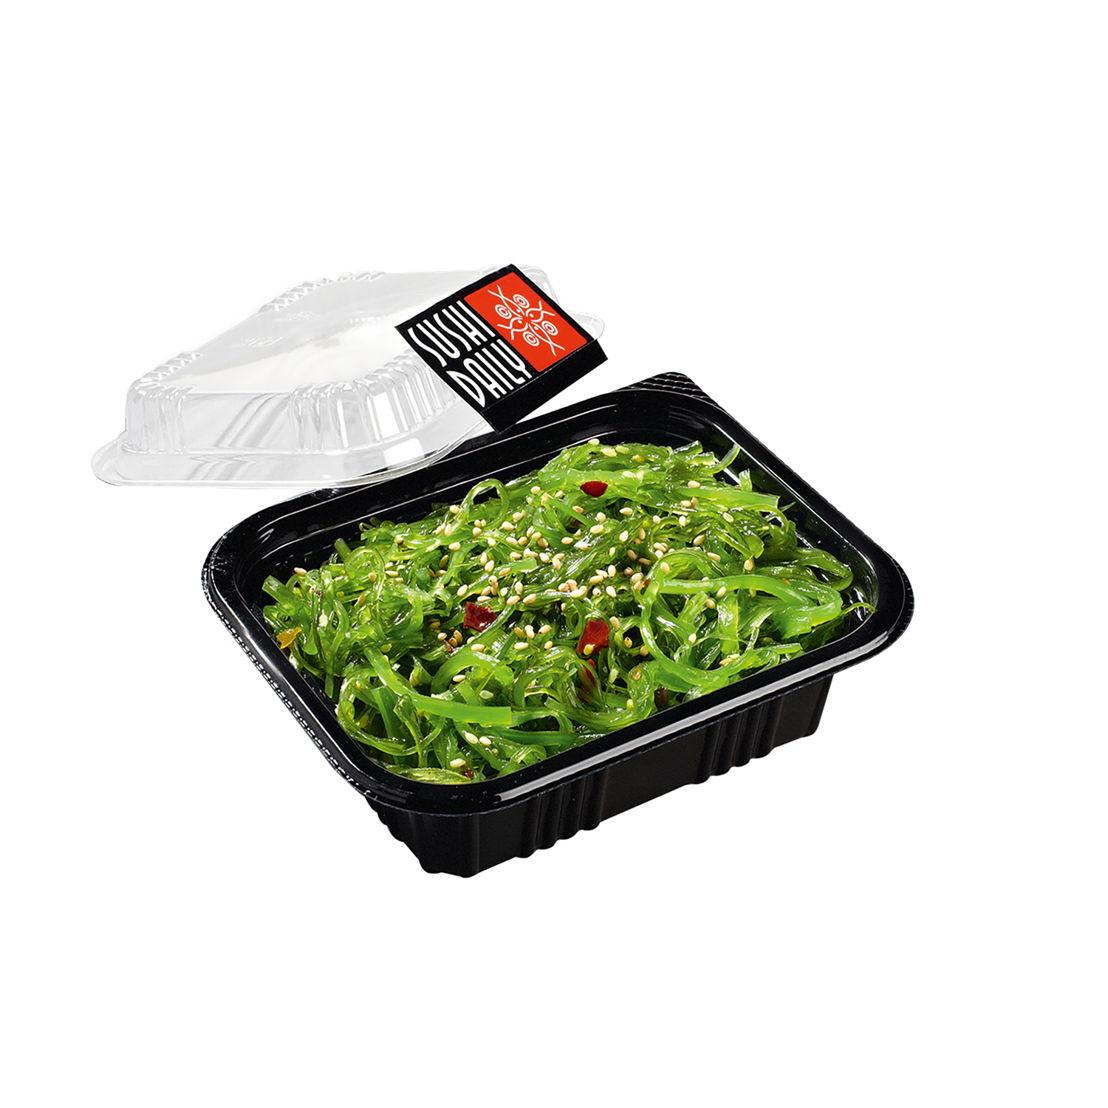 TOP 5 - 2. Wakame Salad